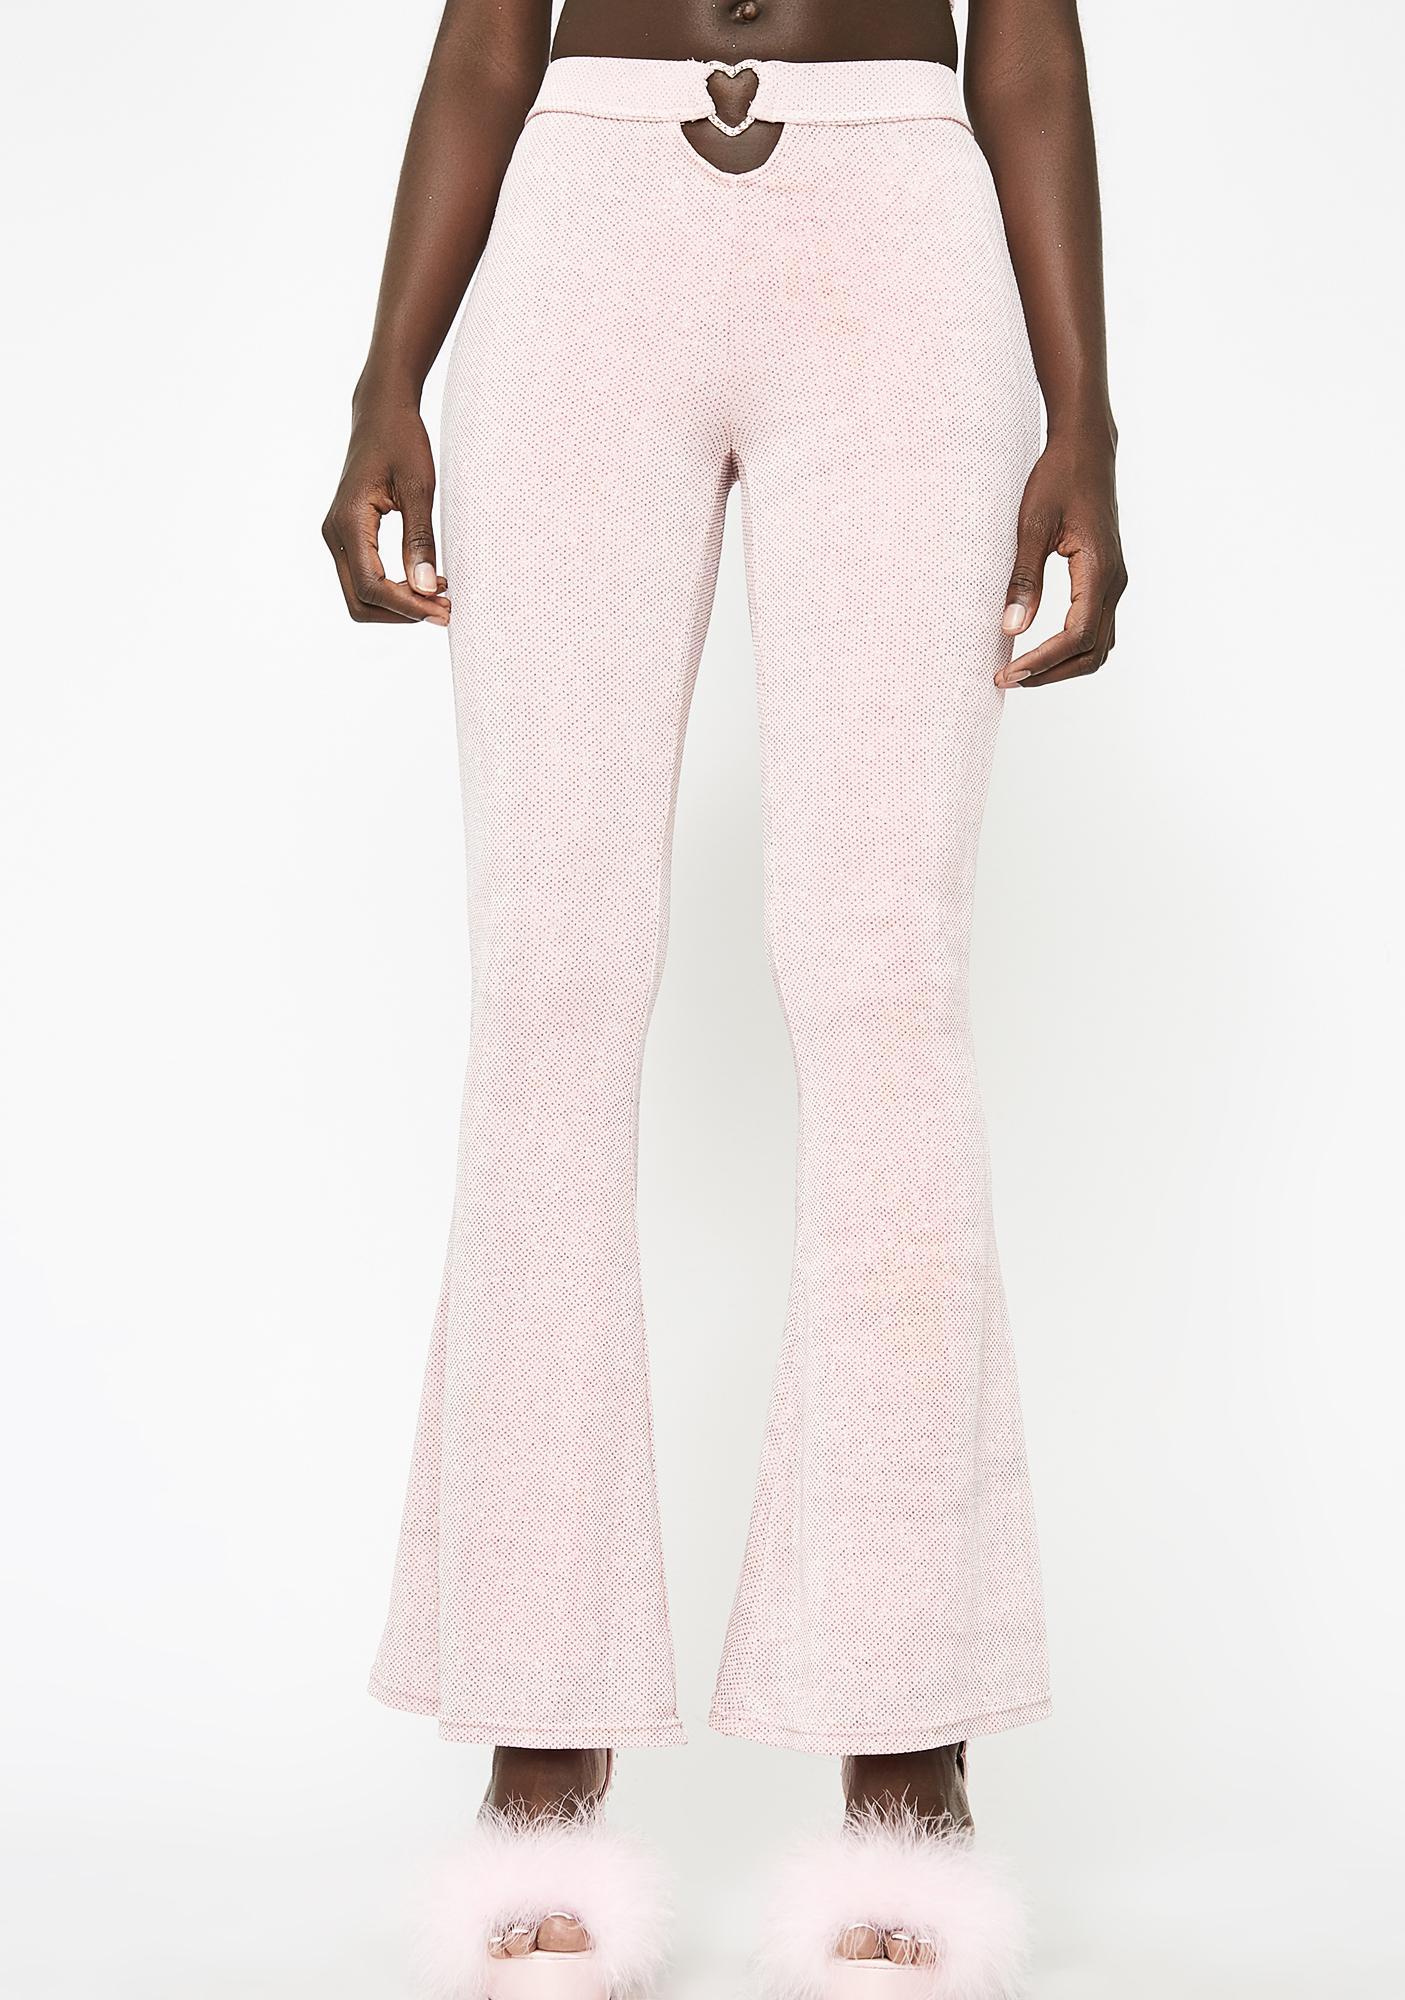 Sugar Thrillz Dream Come True Bedazzled Pants